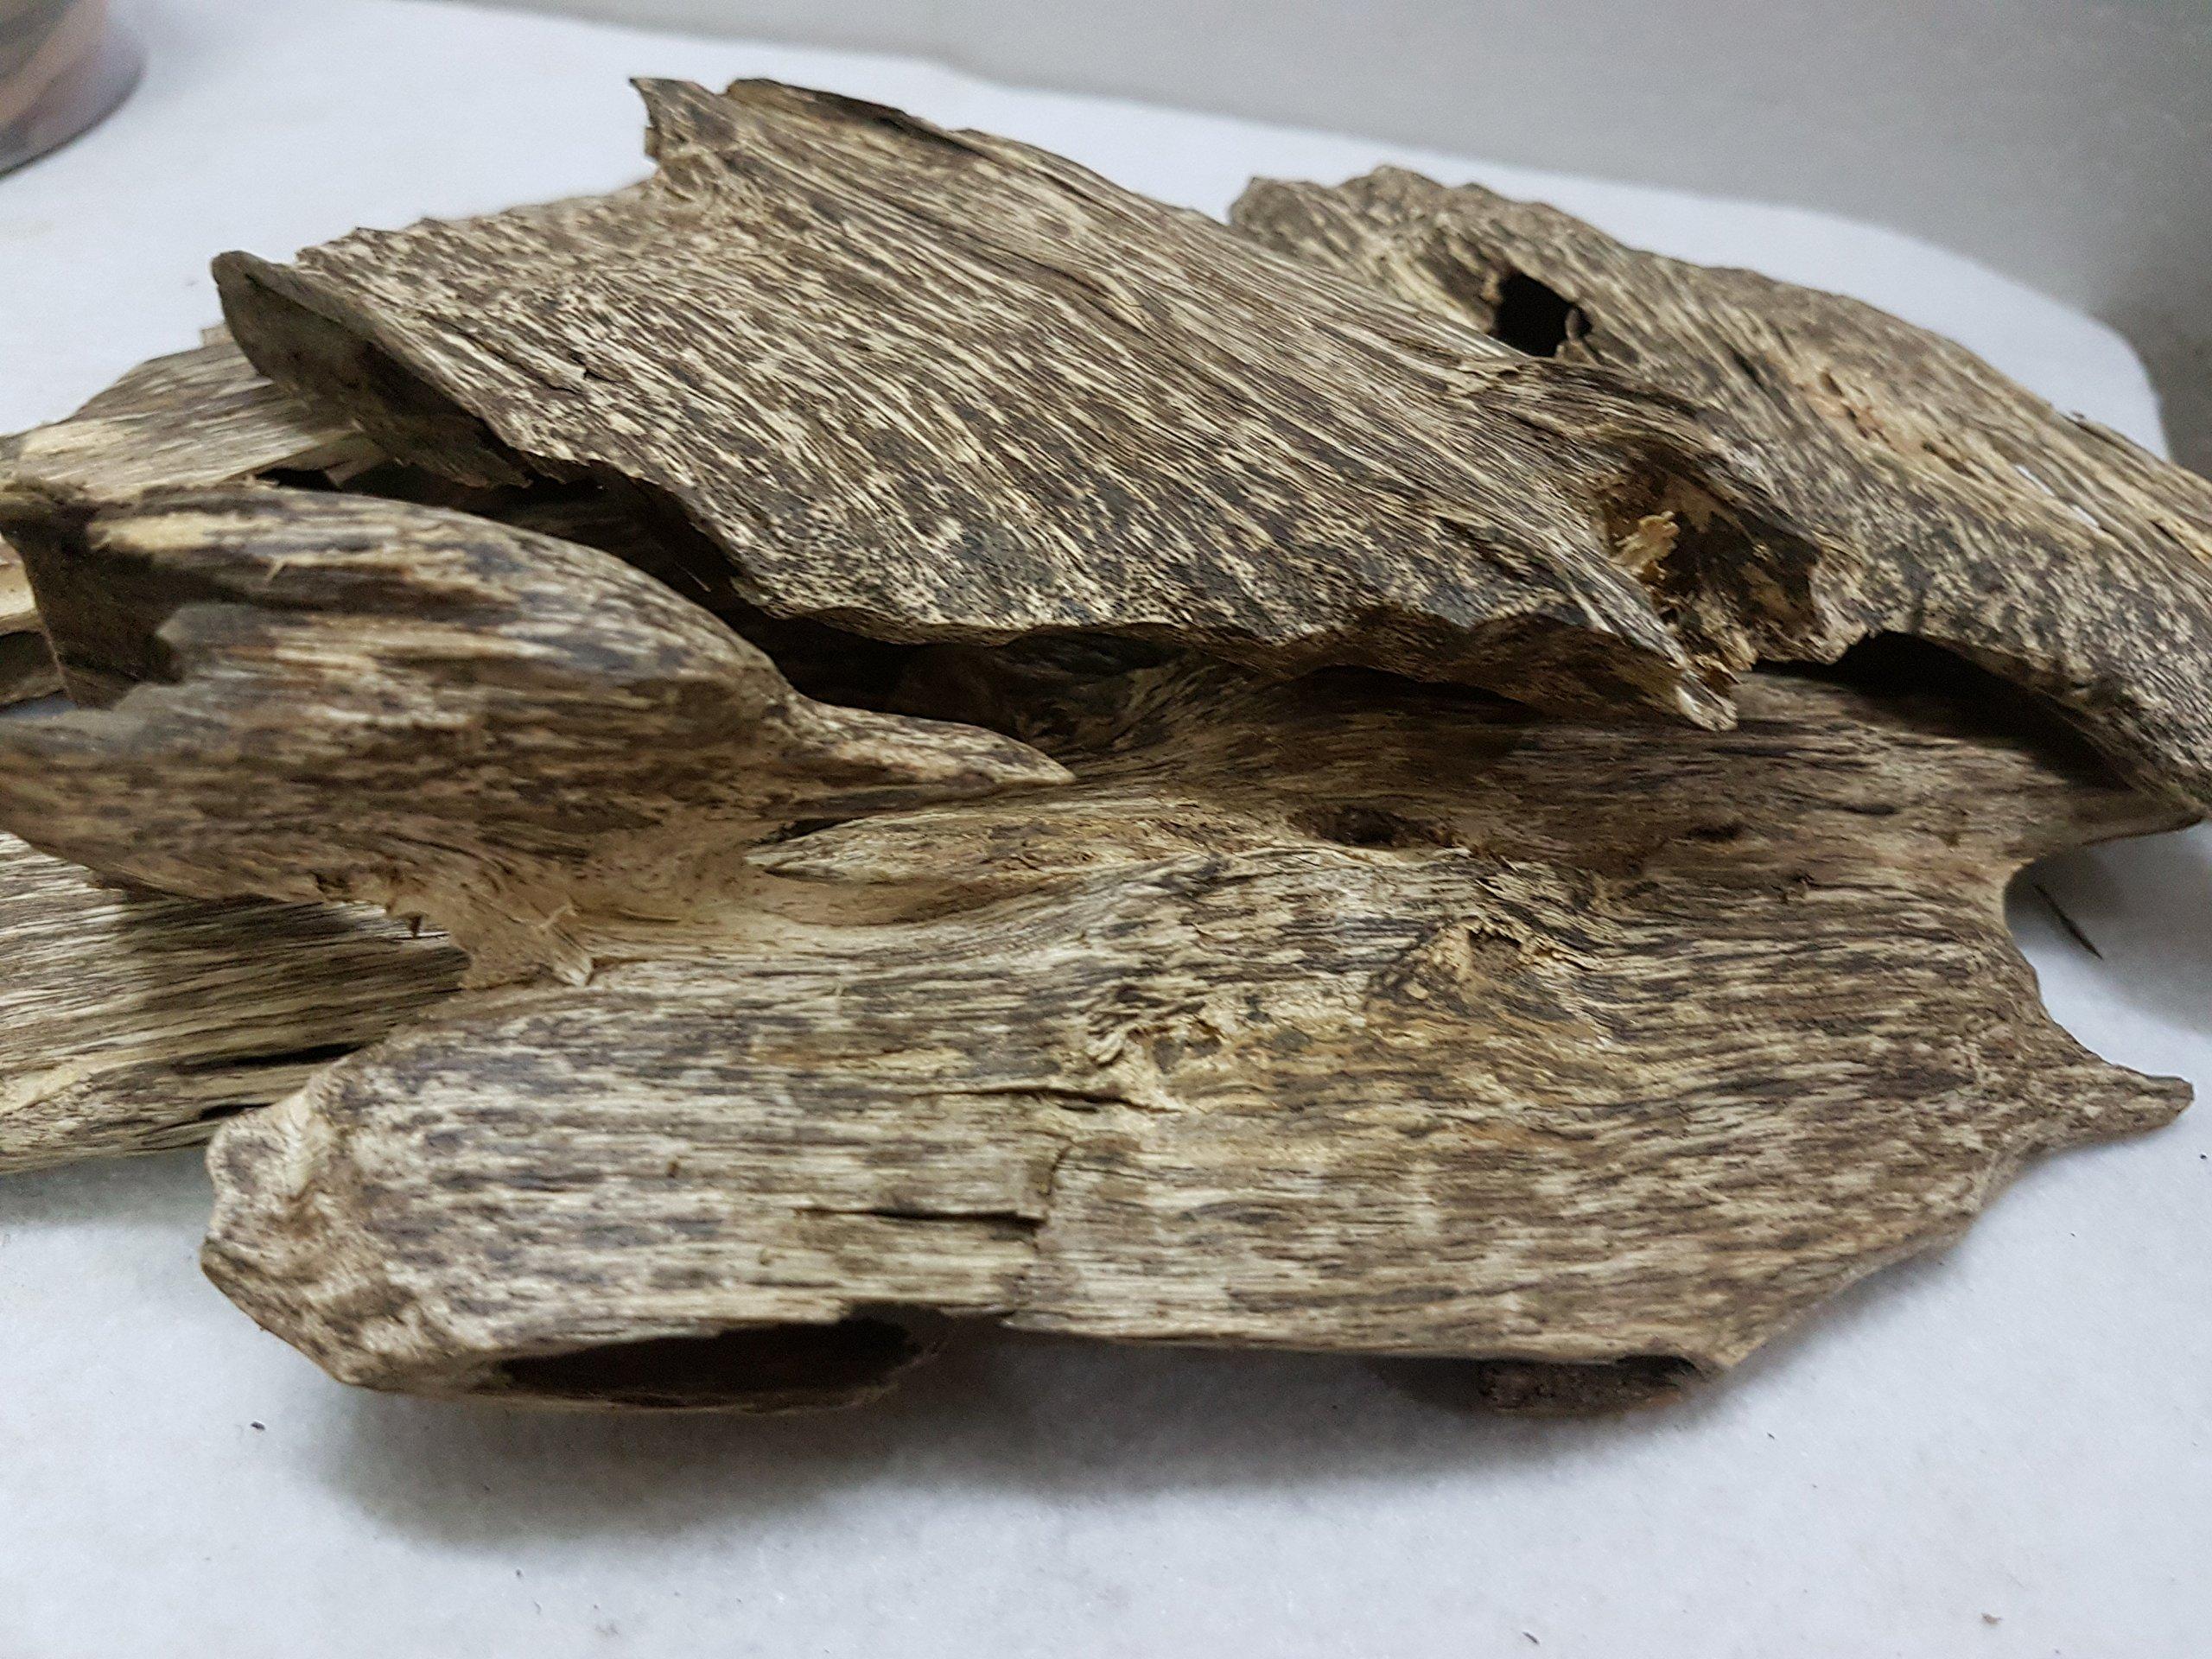 300gr Viet Nam Natural High Oil Agarwood Aloeswood chips - Grade A